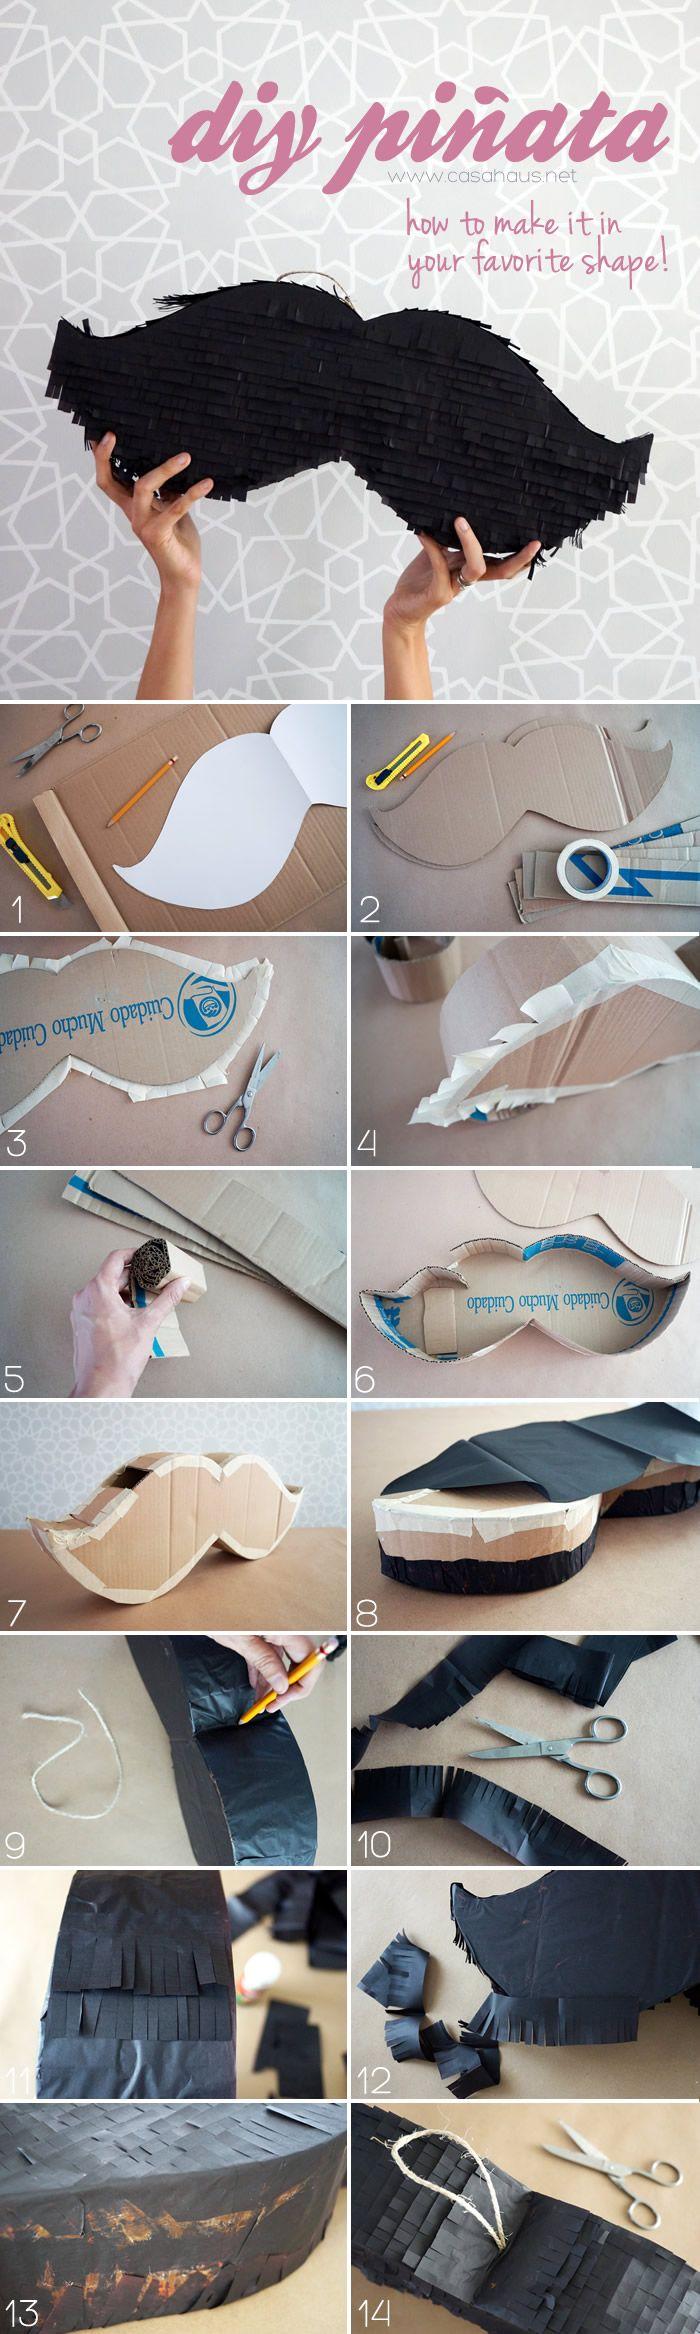 best 25 make pinata ideas on pinterest how to make pinata